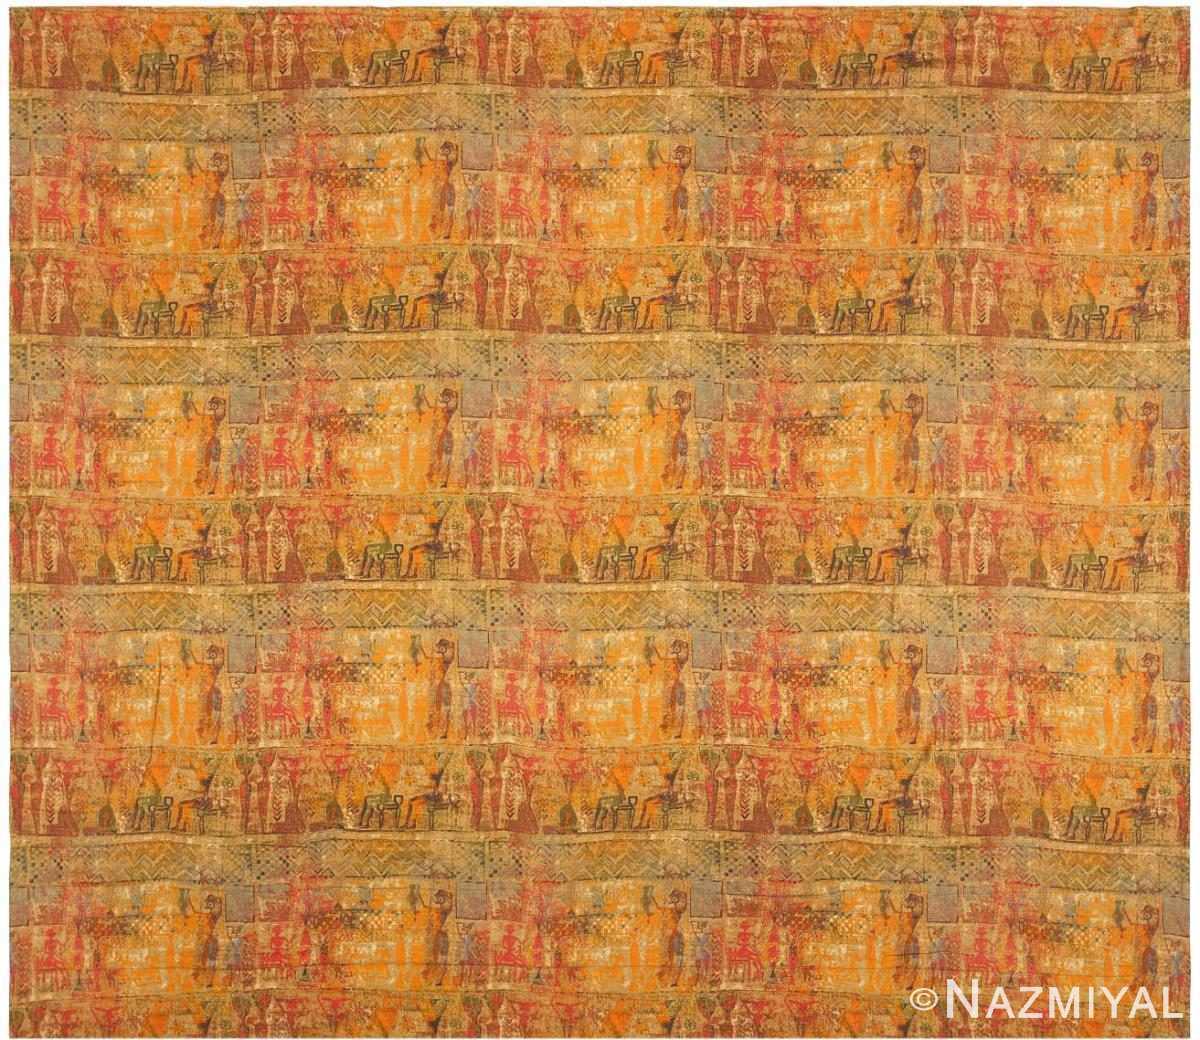 Antique Egyptian Textile 46175 Detail/Large View